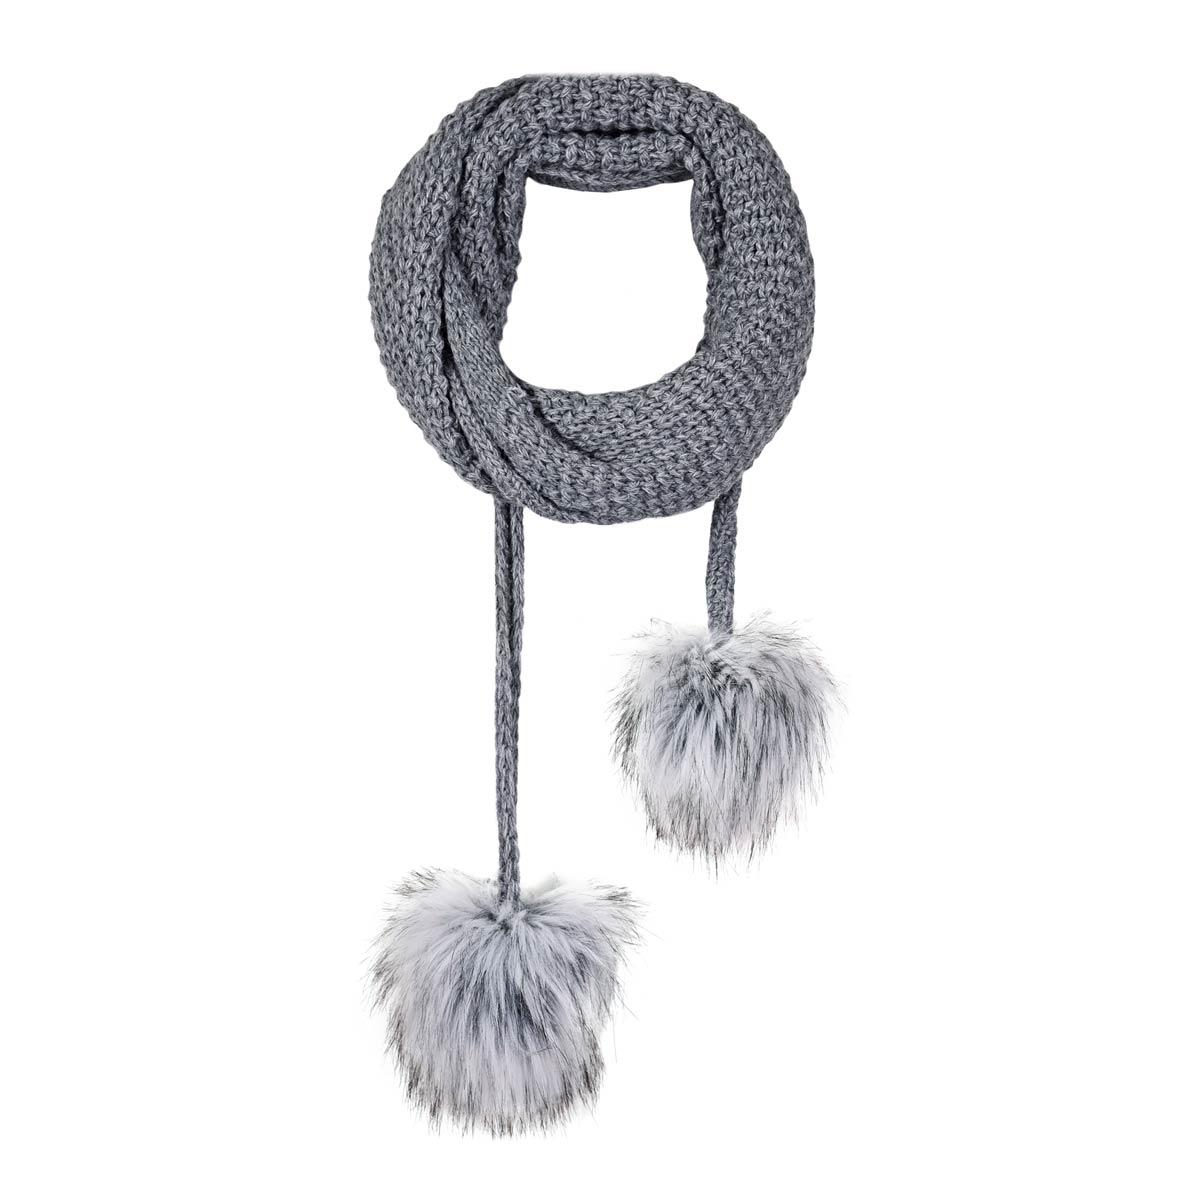 AT-05867_F12-1--_Echarpe-hiver-grise